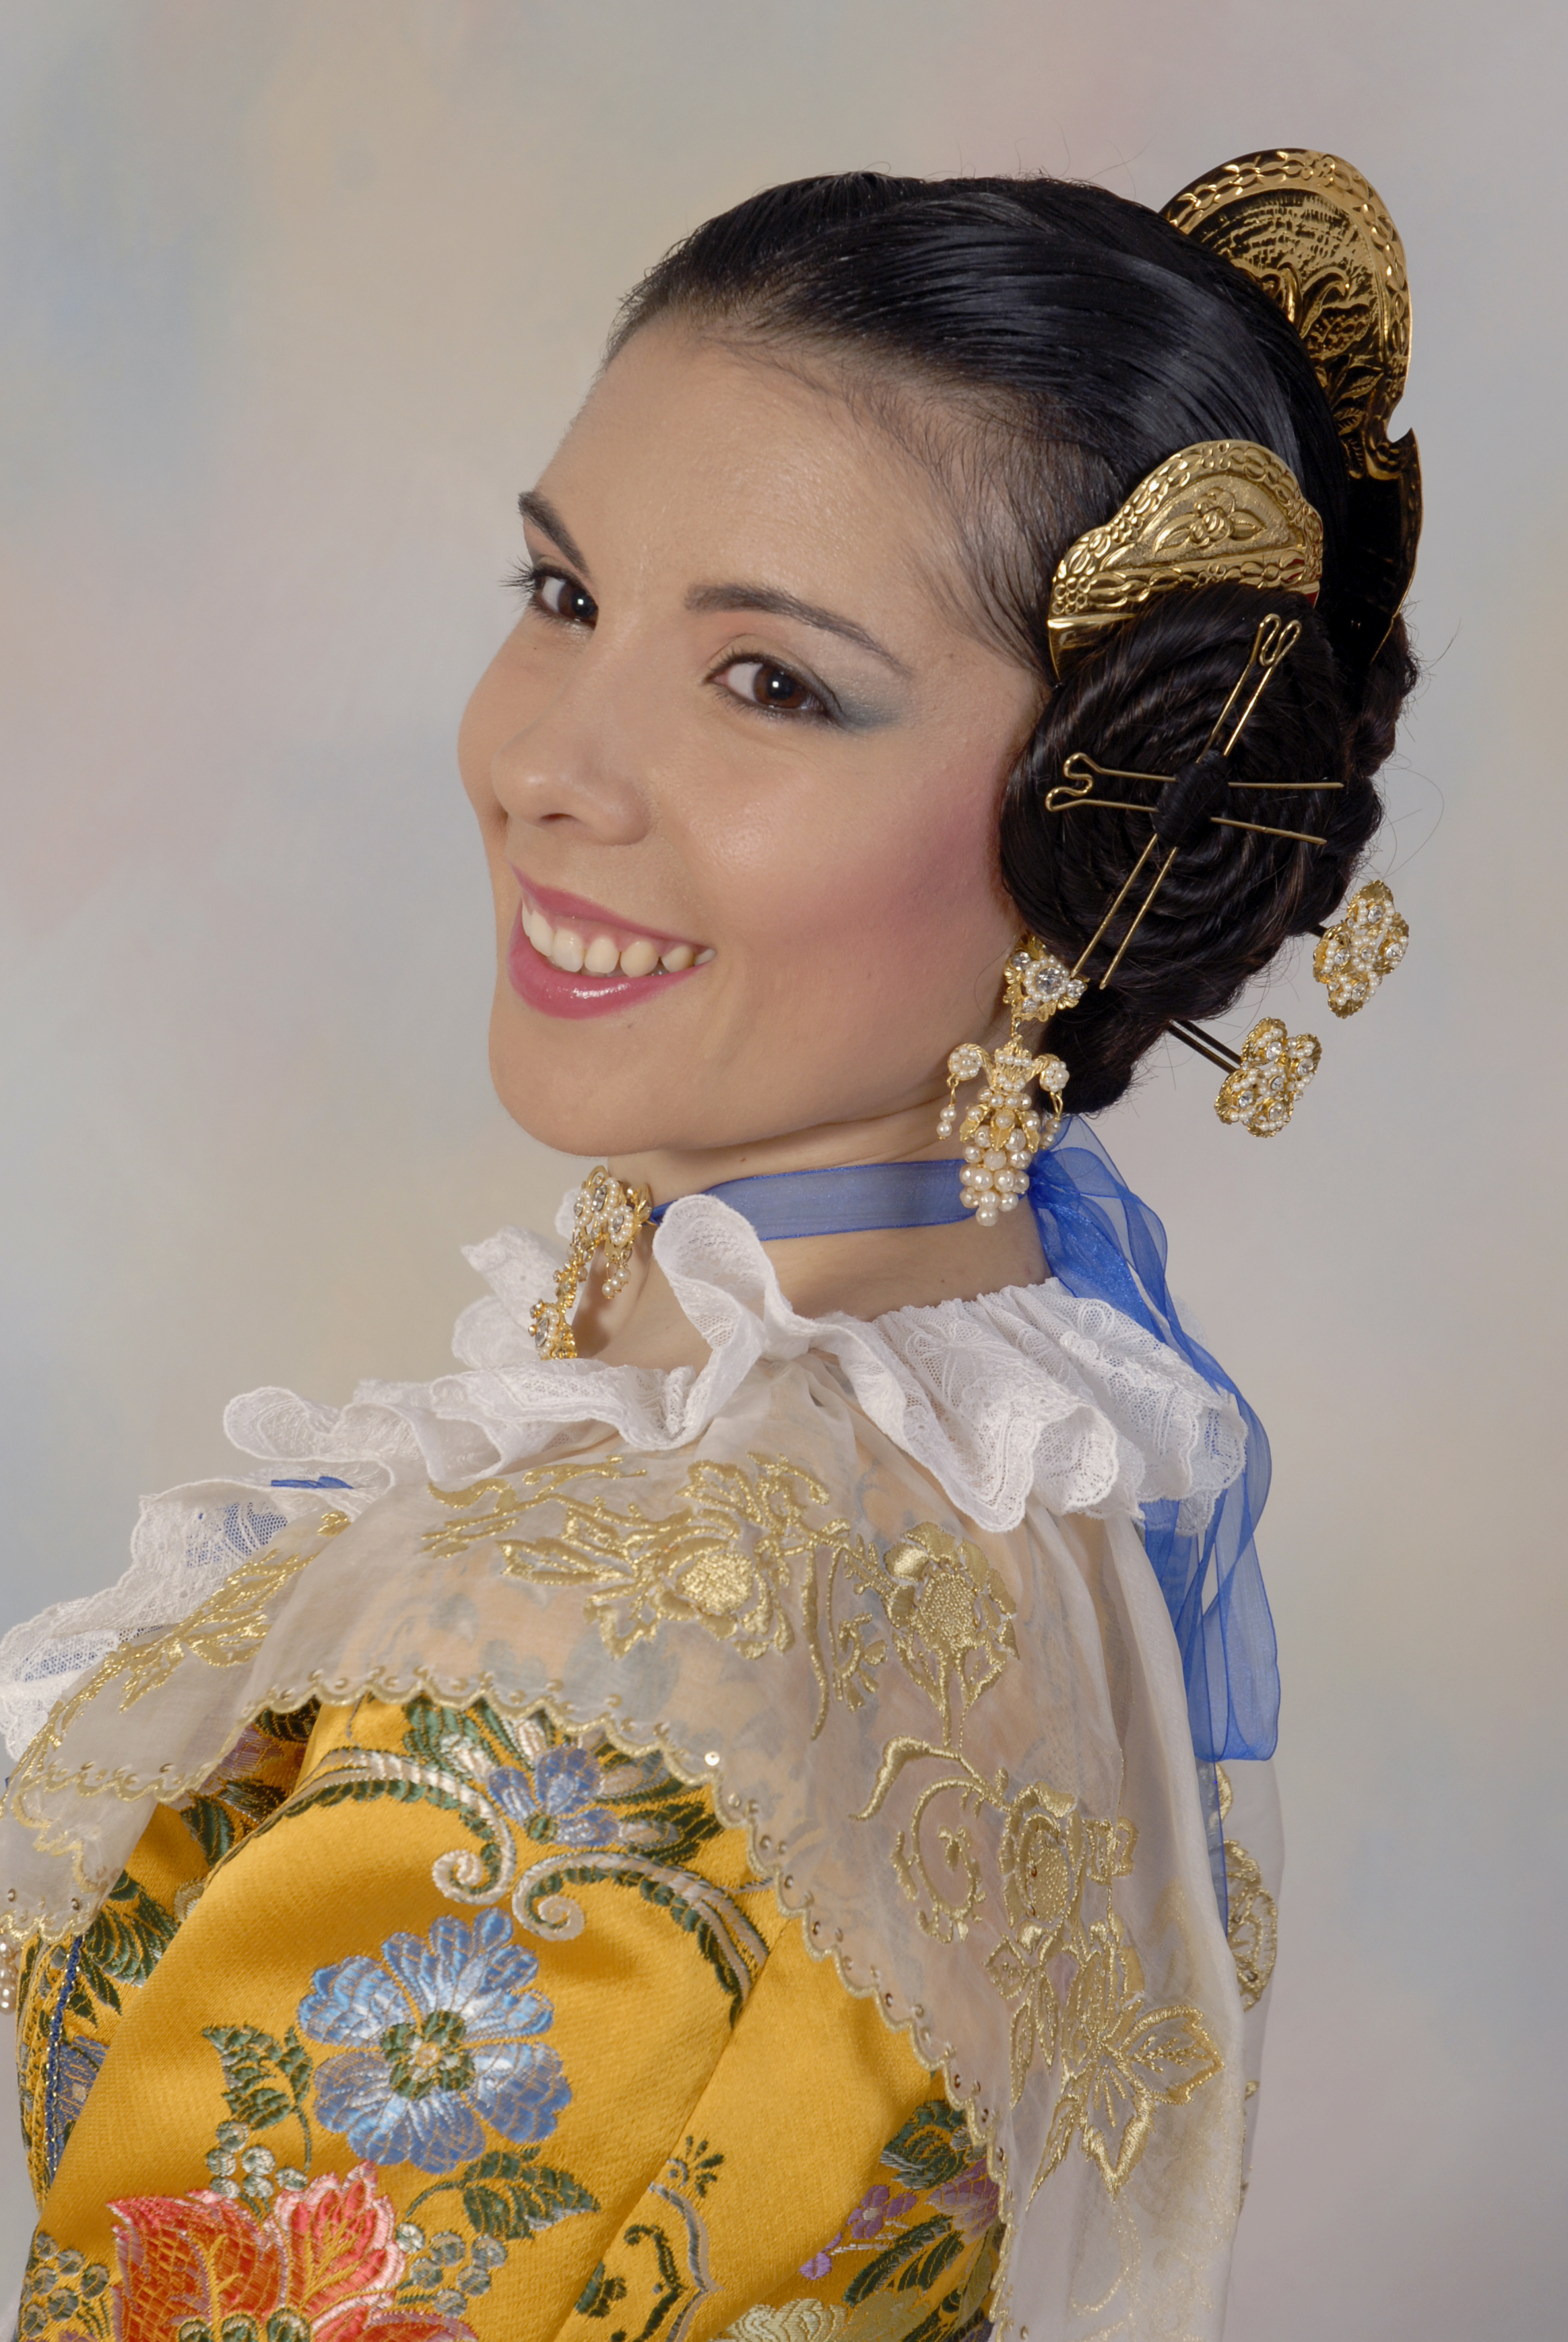 Paula Zaragoza